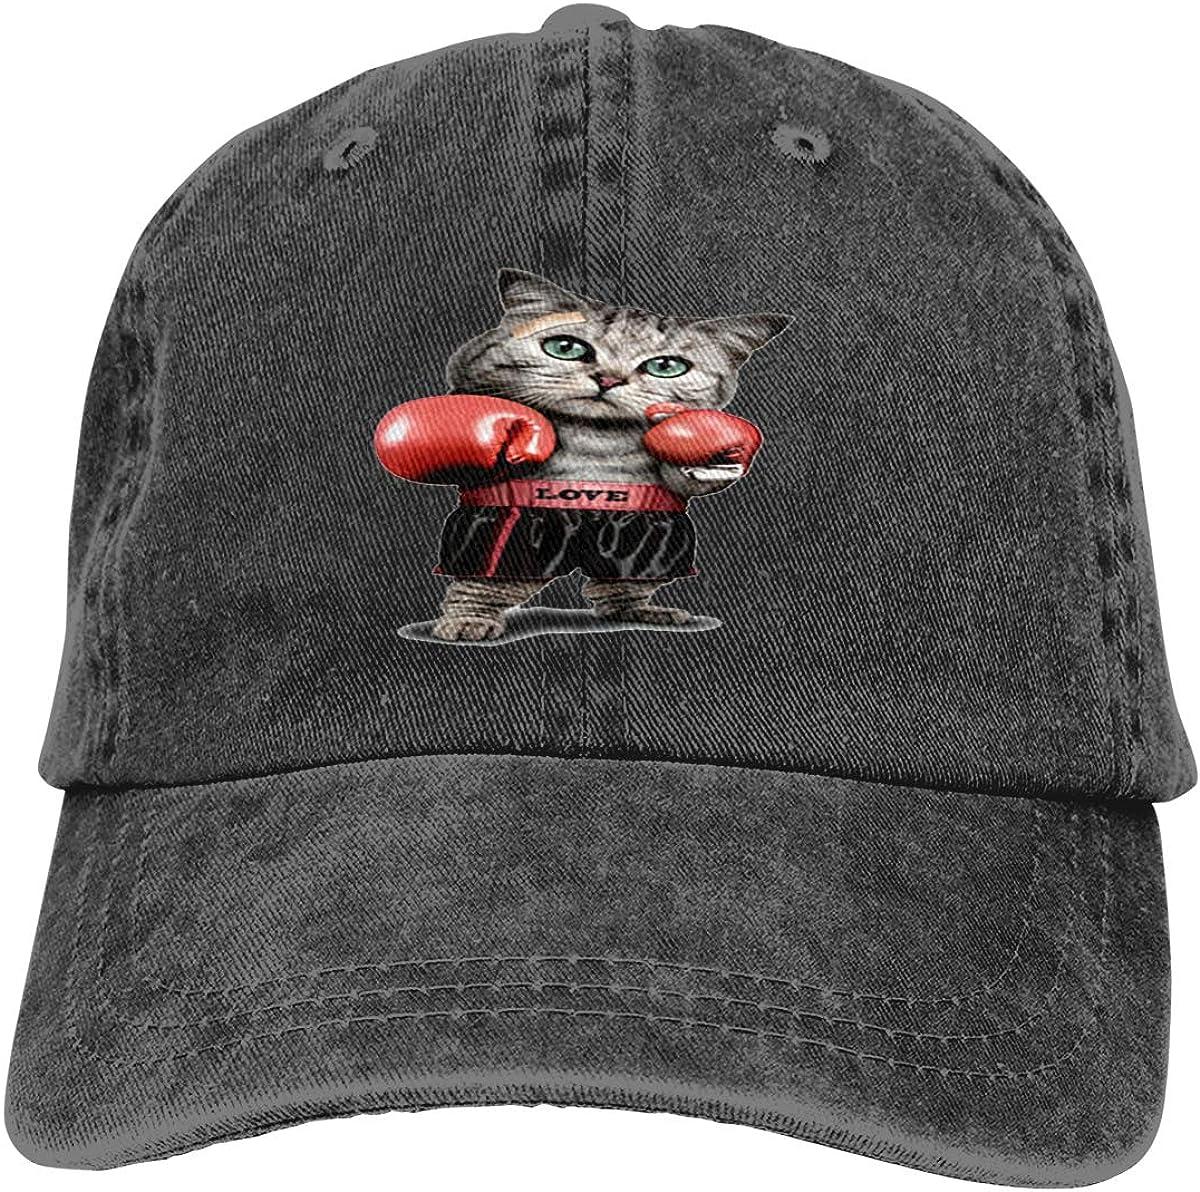 Boxing Gloves Denim Hat Adjustable Neutral Casual Baseball cap